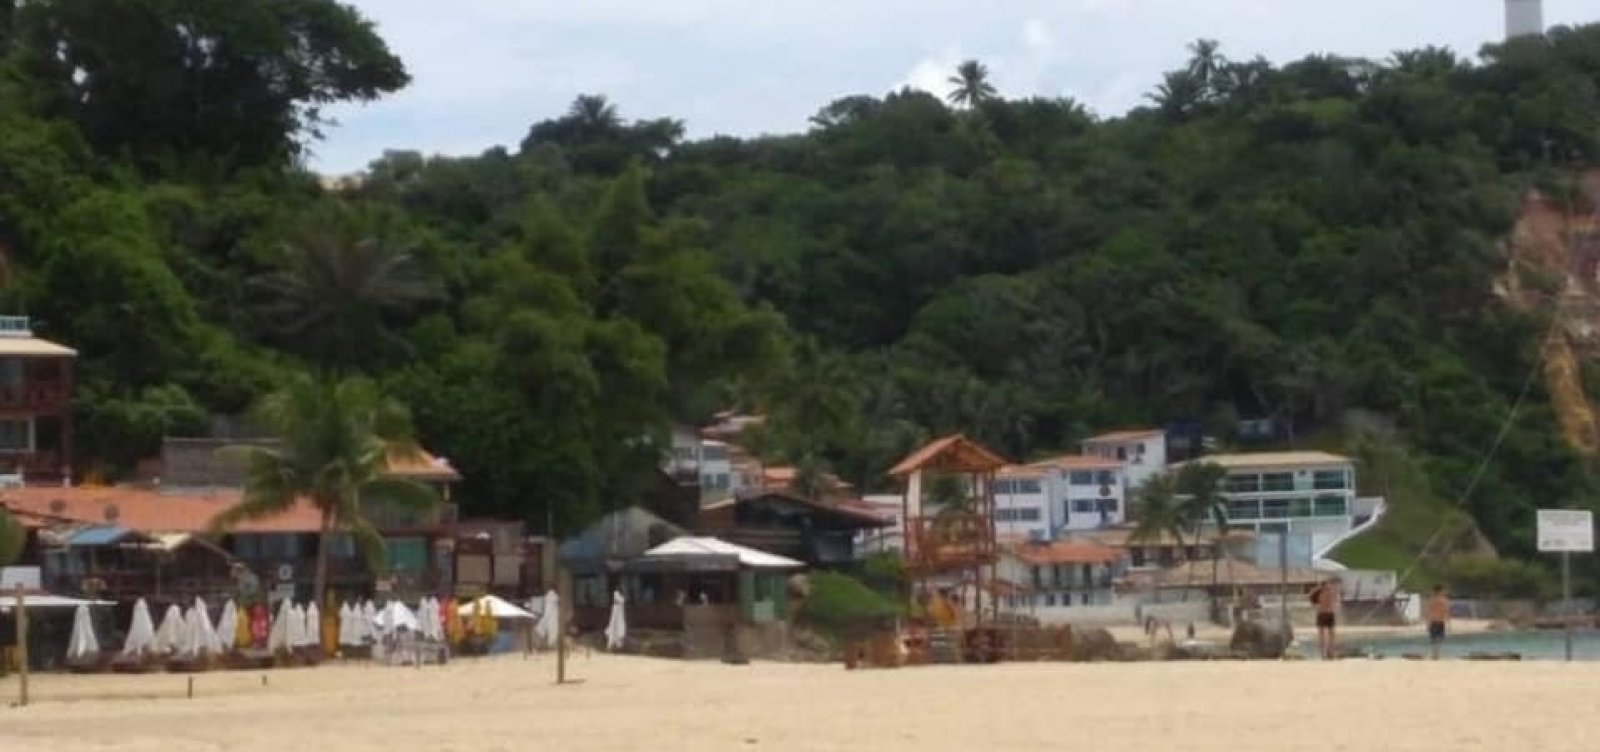 [Coronavírus: Cairu usará recursos da tarifa de acesso a Morro para beneficiar famílias carentes]